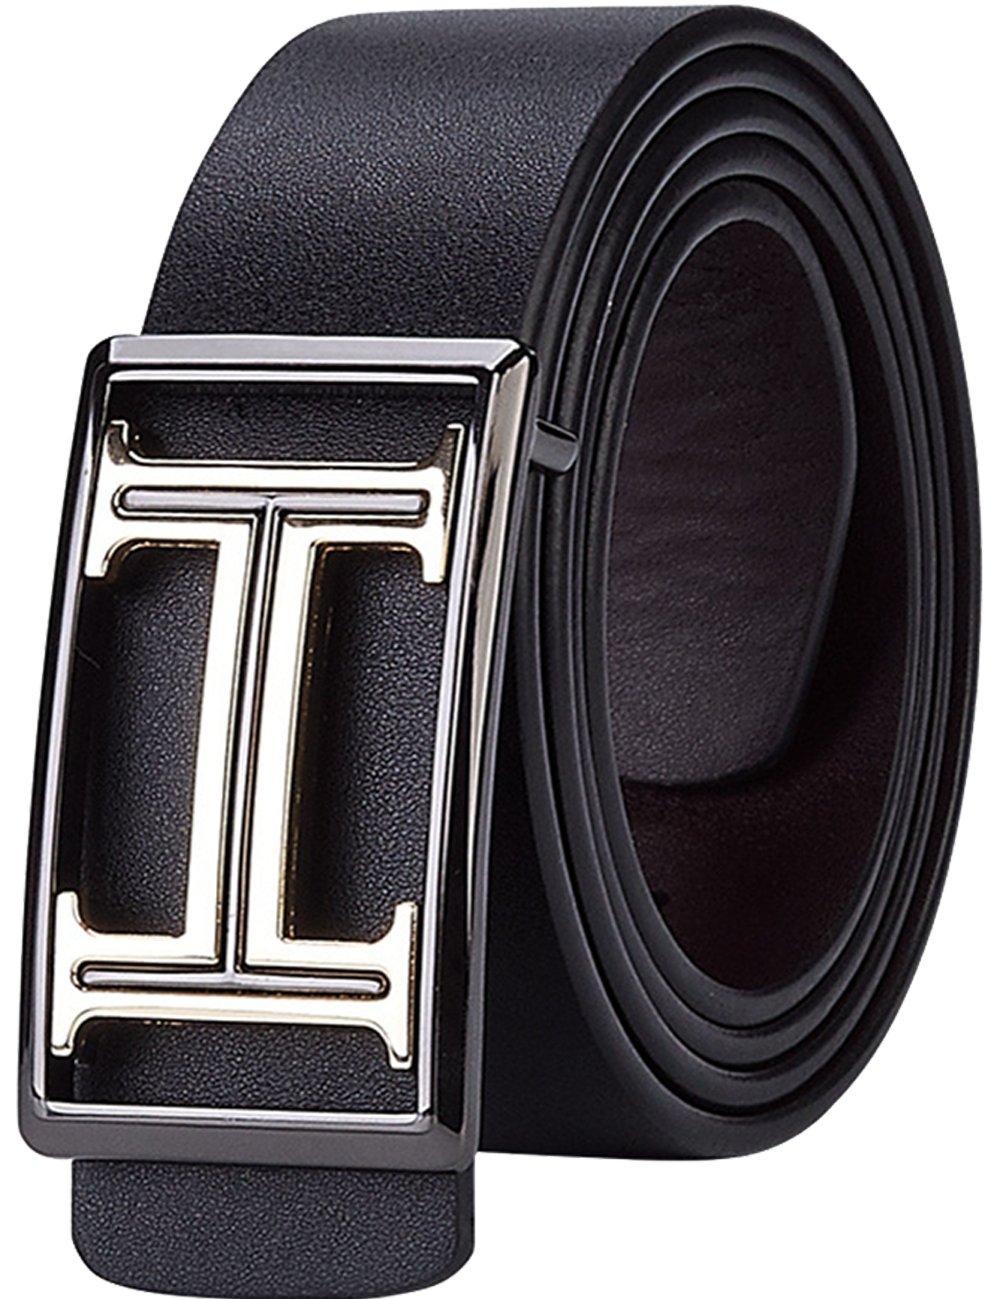 Menschwear Men's Geniune Leather Belt with Slide Metal Buckle 38mm Black